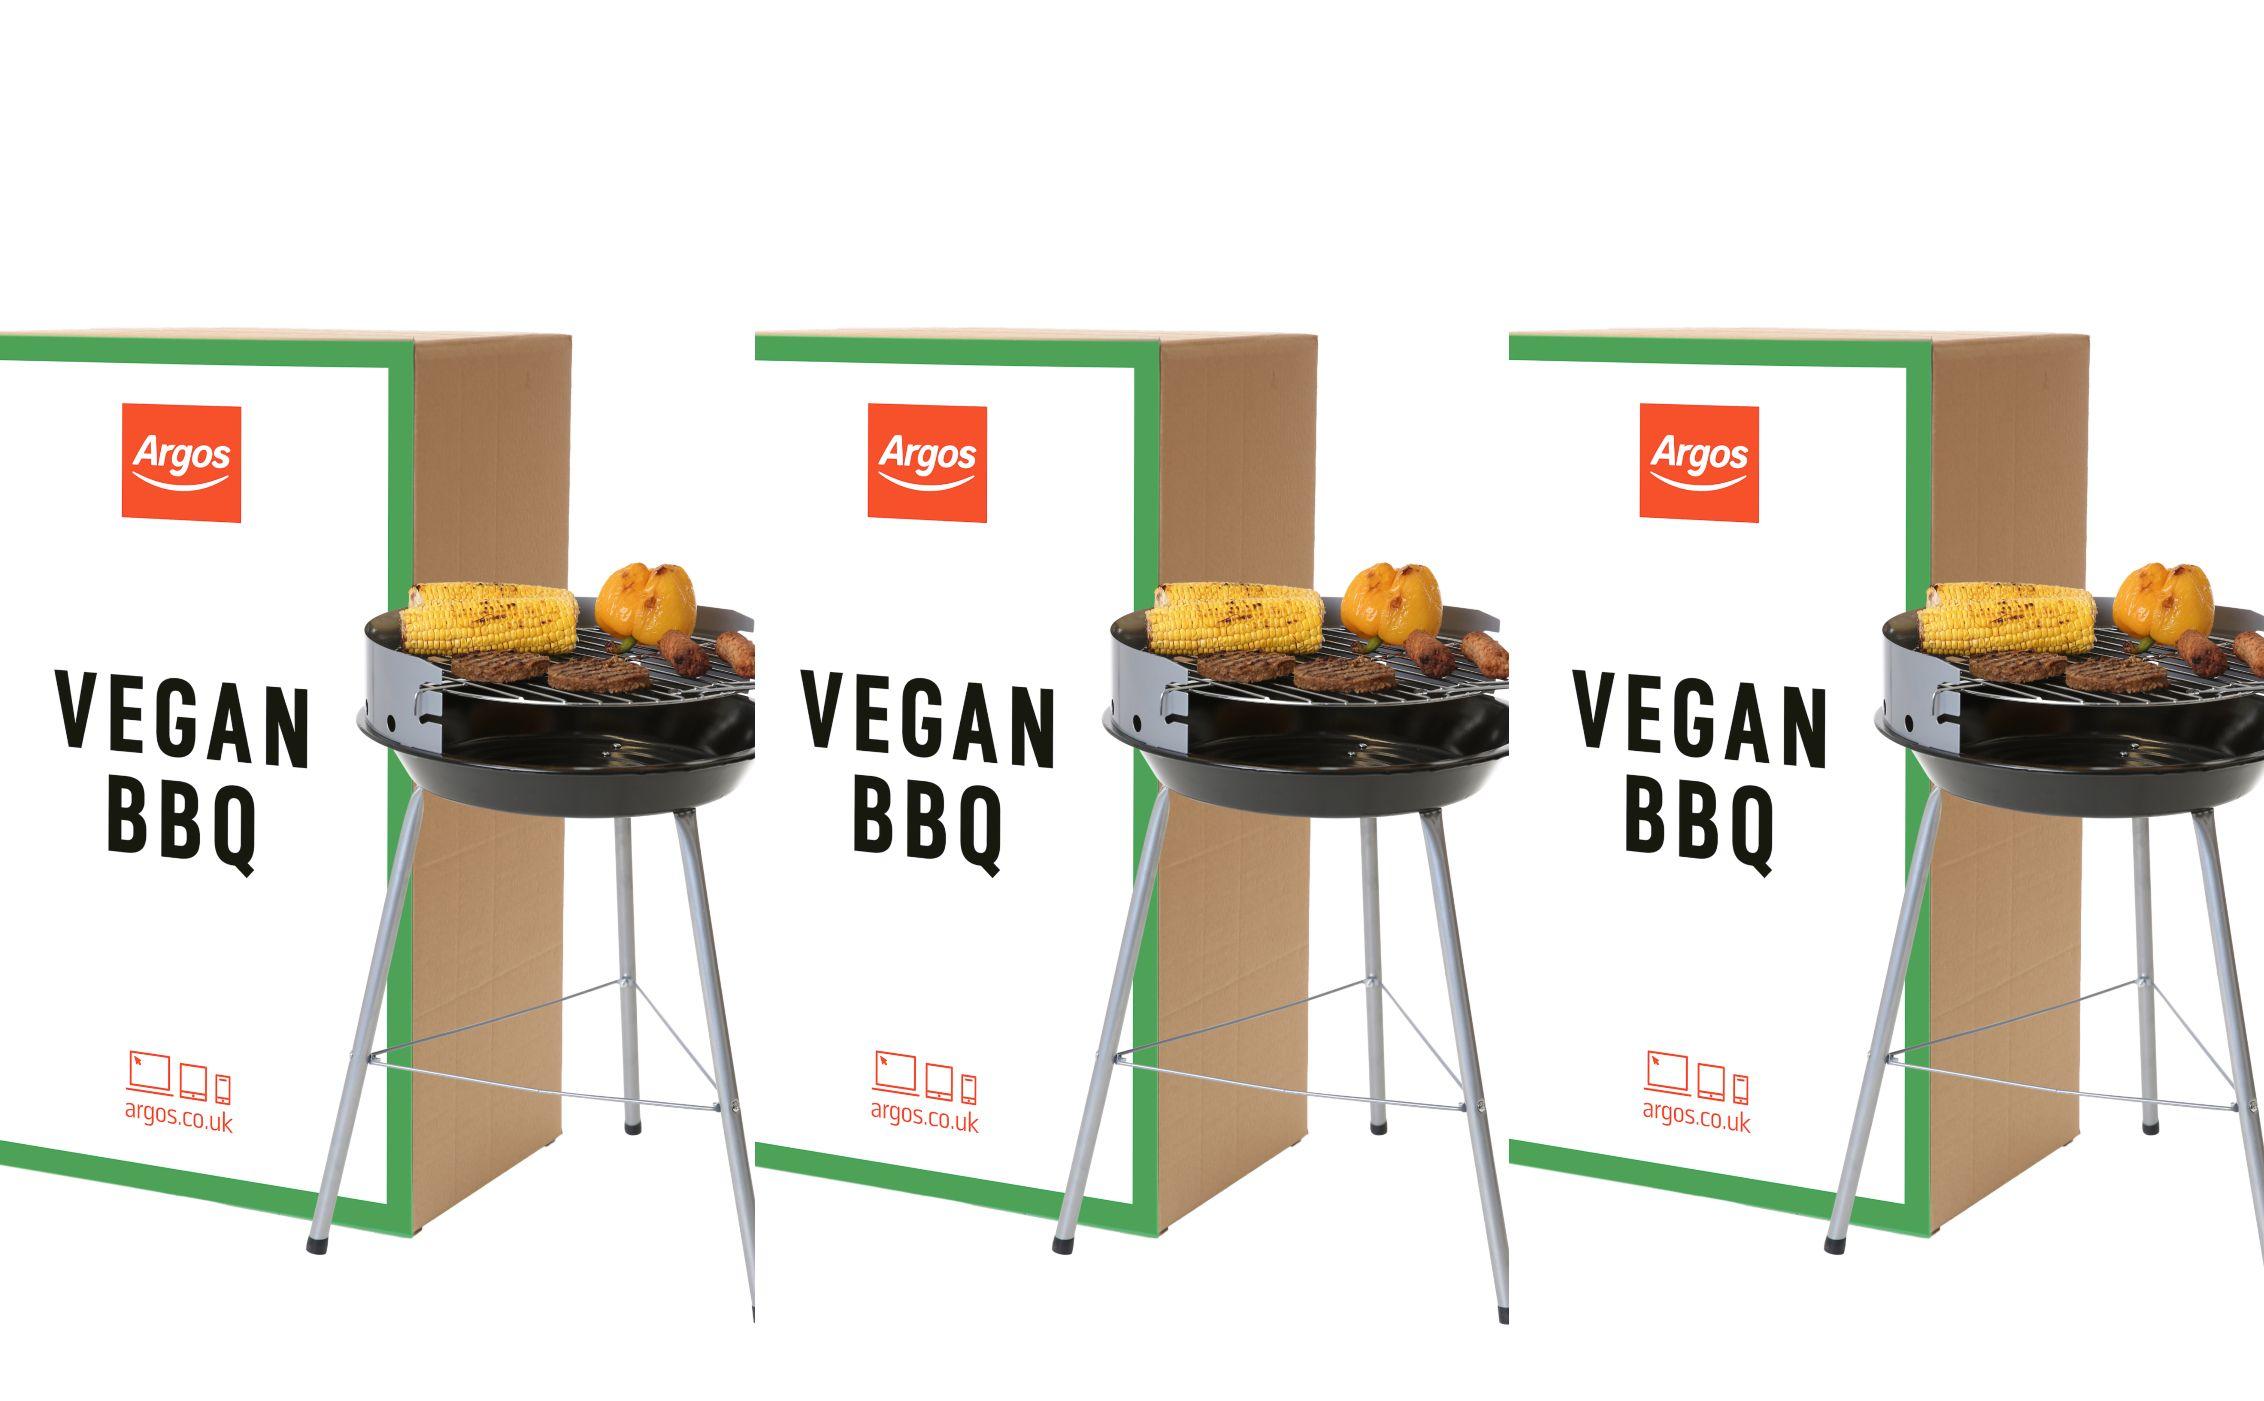 Argos launch Vegan BBQ  sc 1 st  House Beautiful & Argos Launches Worldu0027s First Vegan BBQ - Argos Barbecues